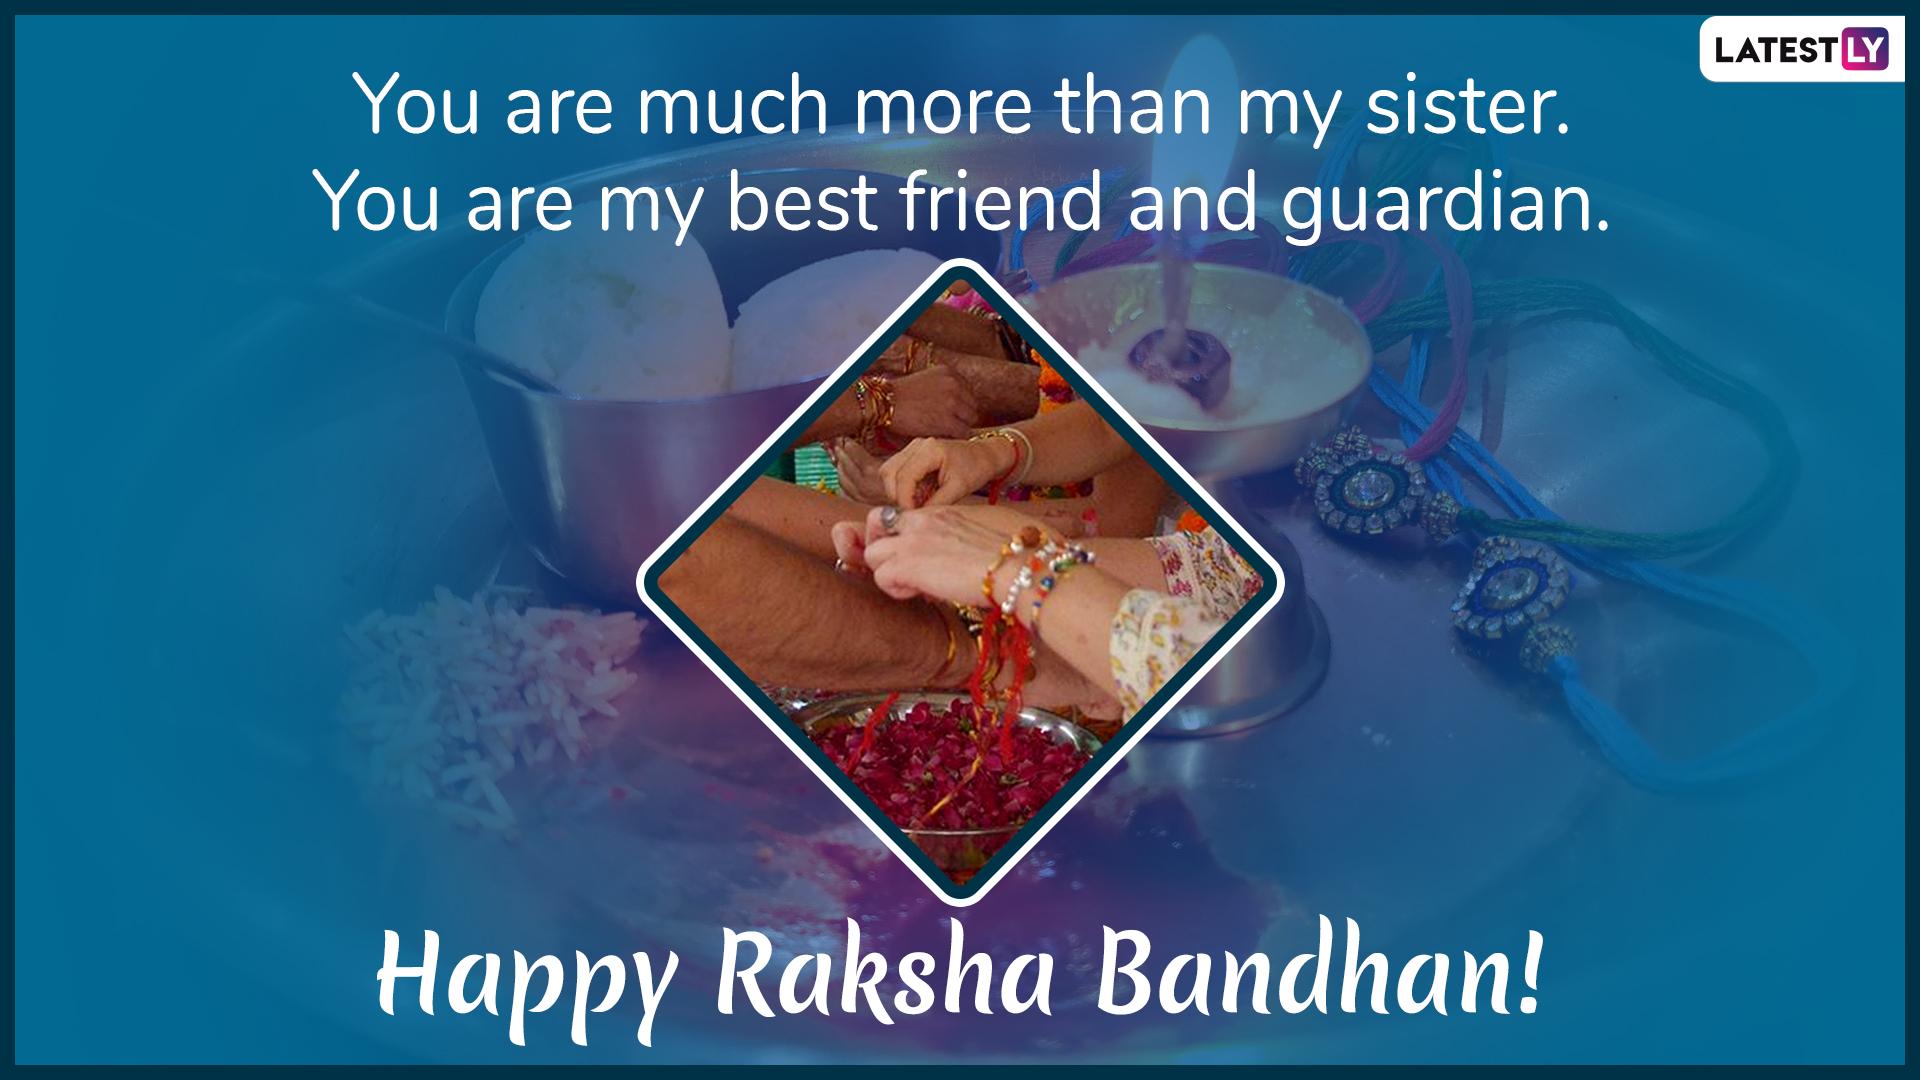 Raksha Bandhan 2019 greeting card for download 3 (Photo credits: File Image)